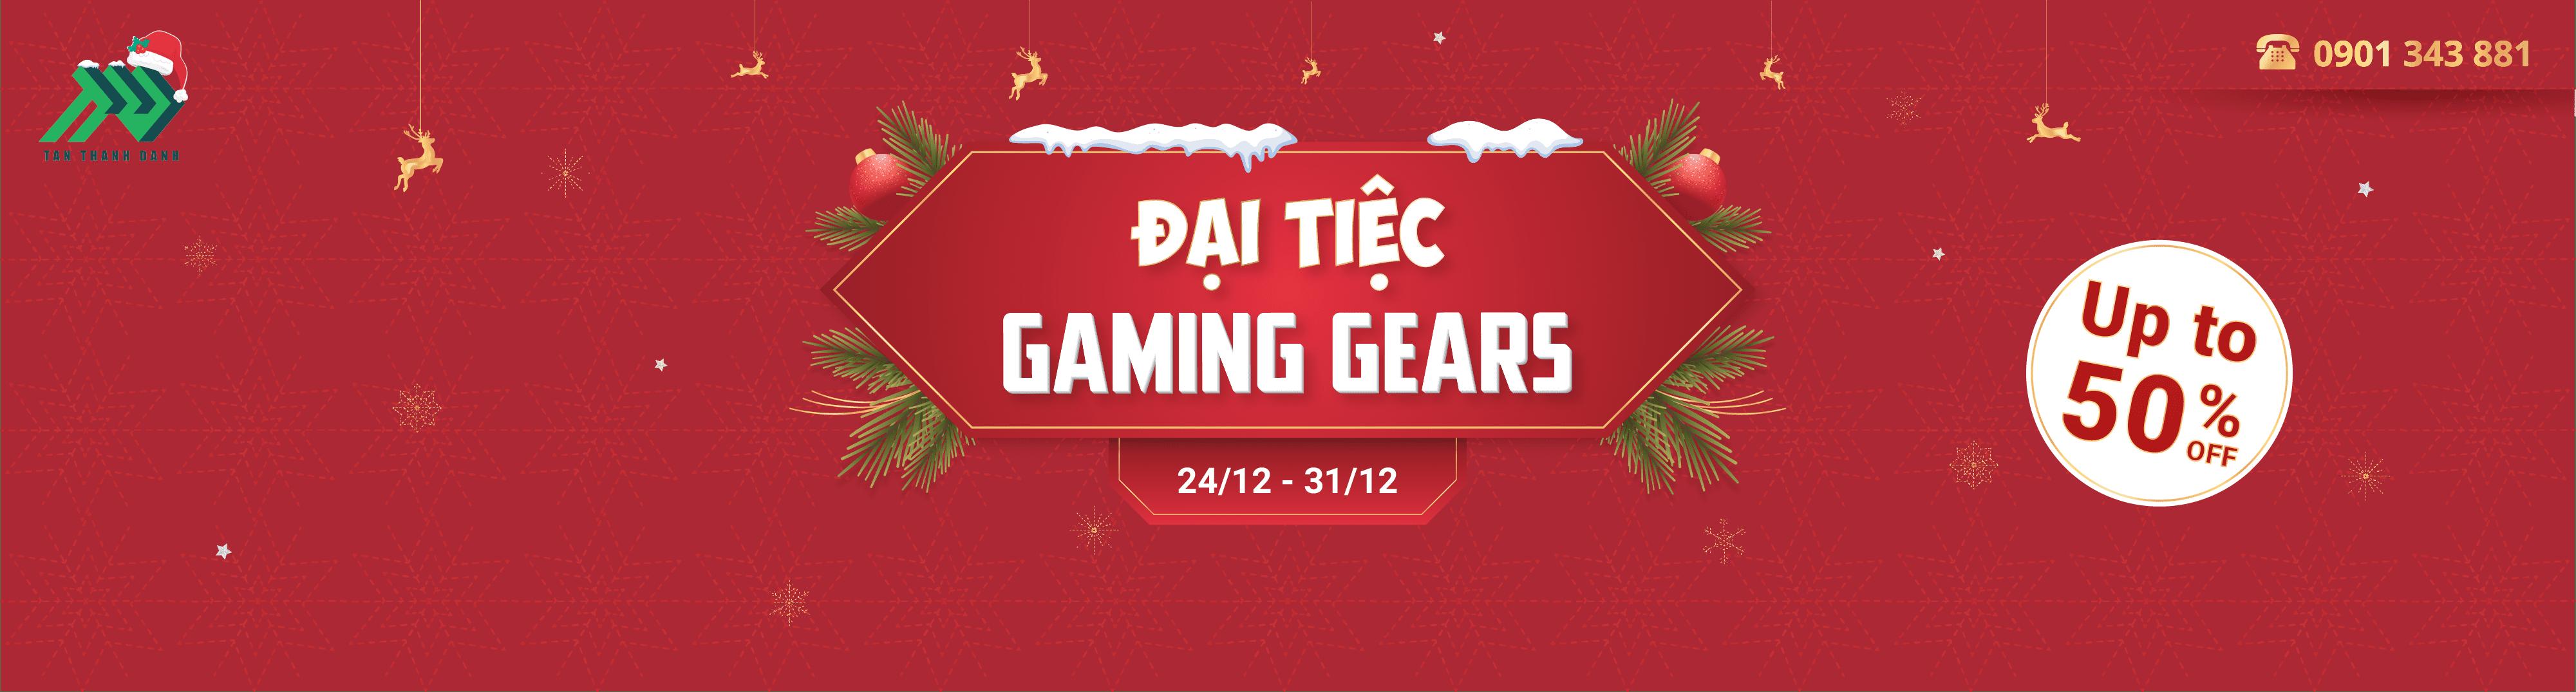 TTD Promotion 202012 DaiTiecGGXmas Title